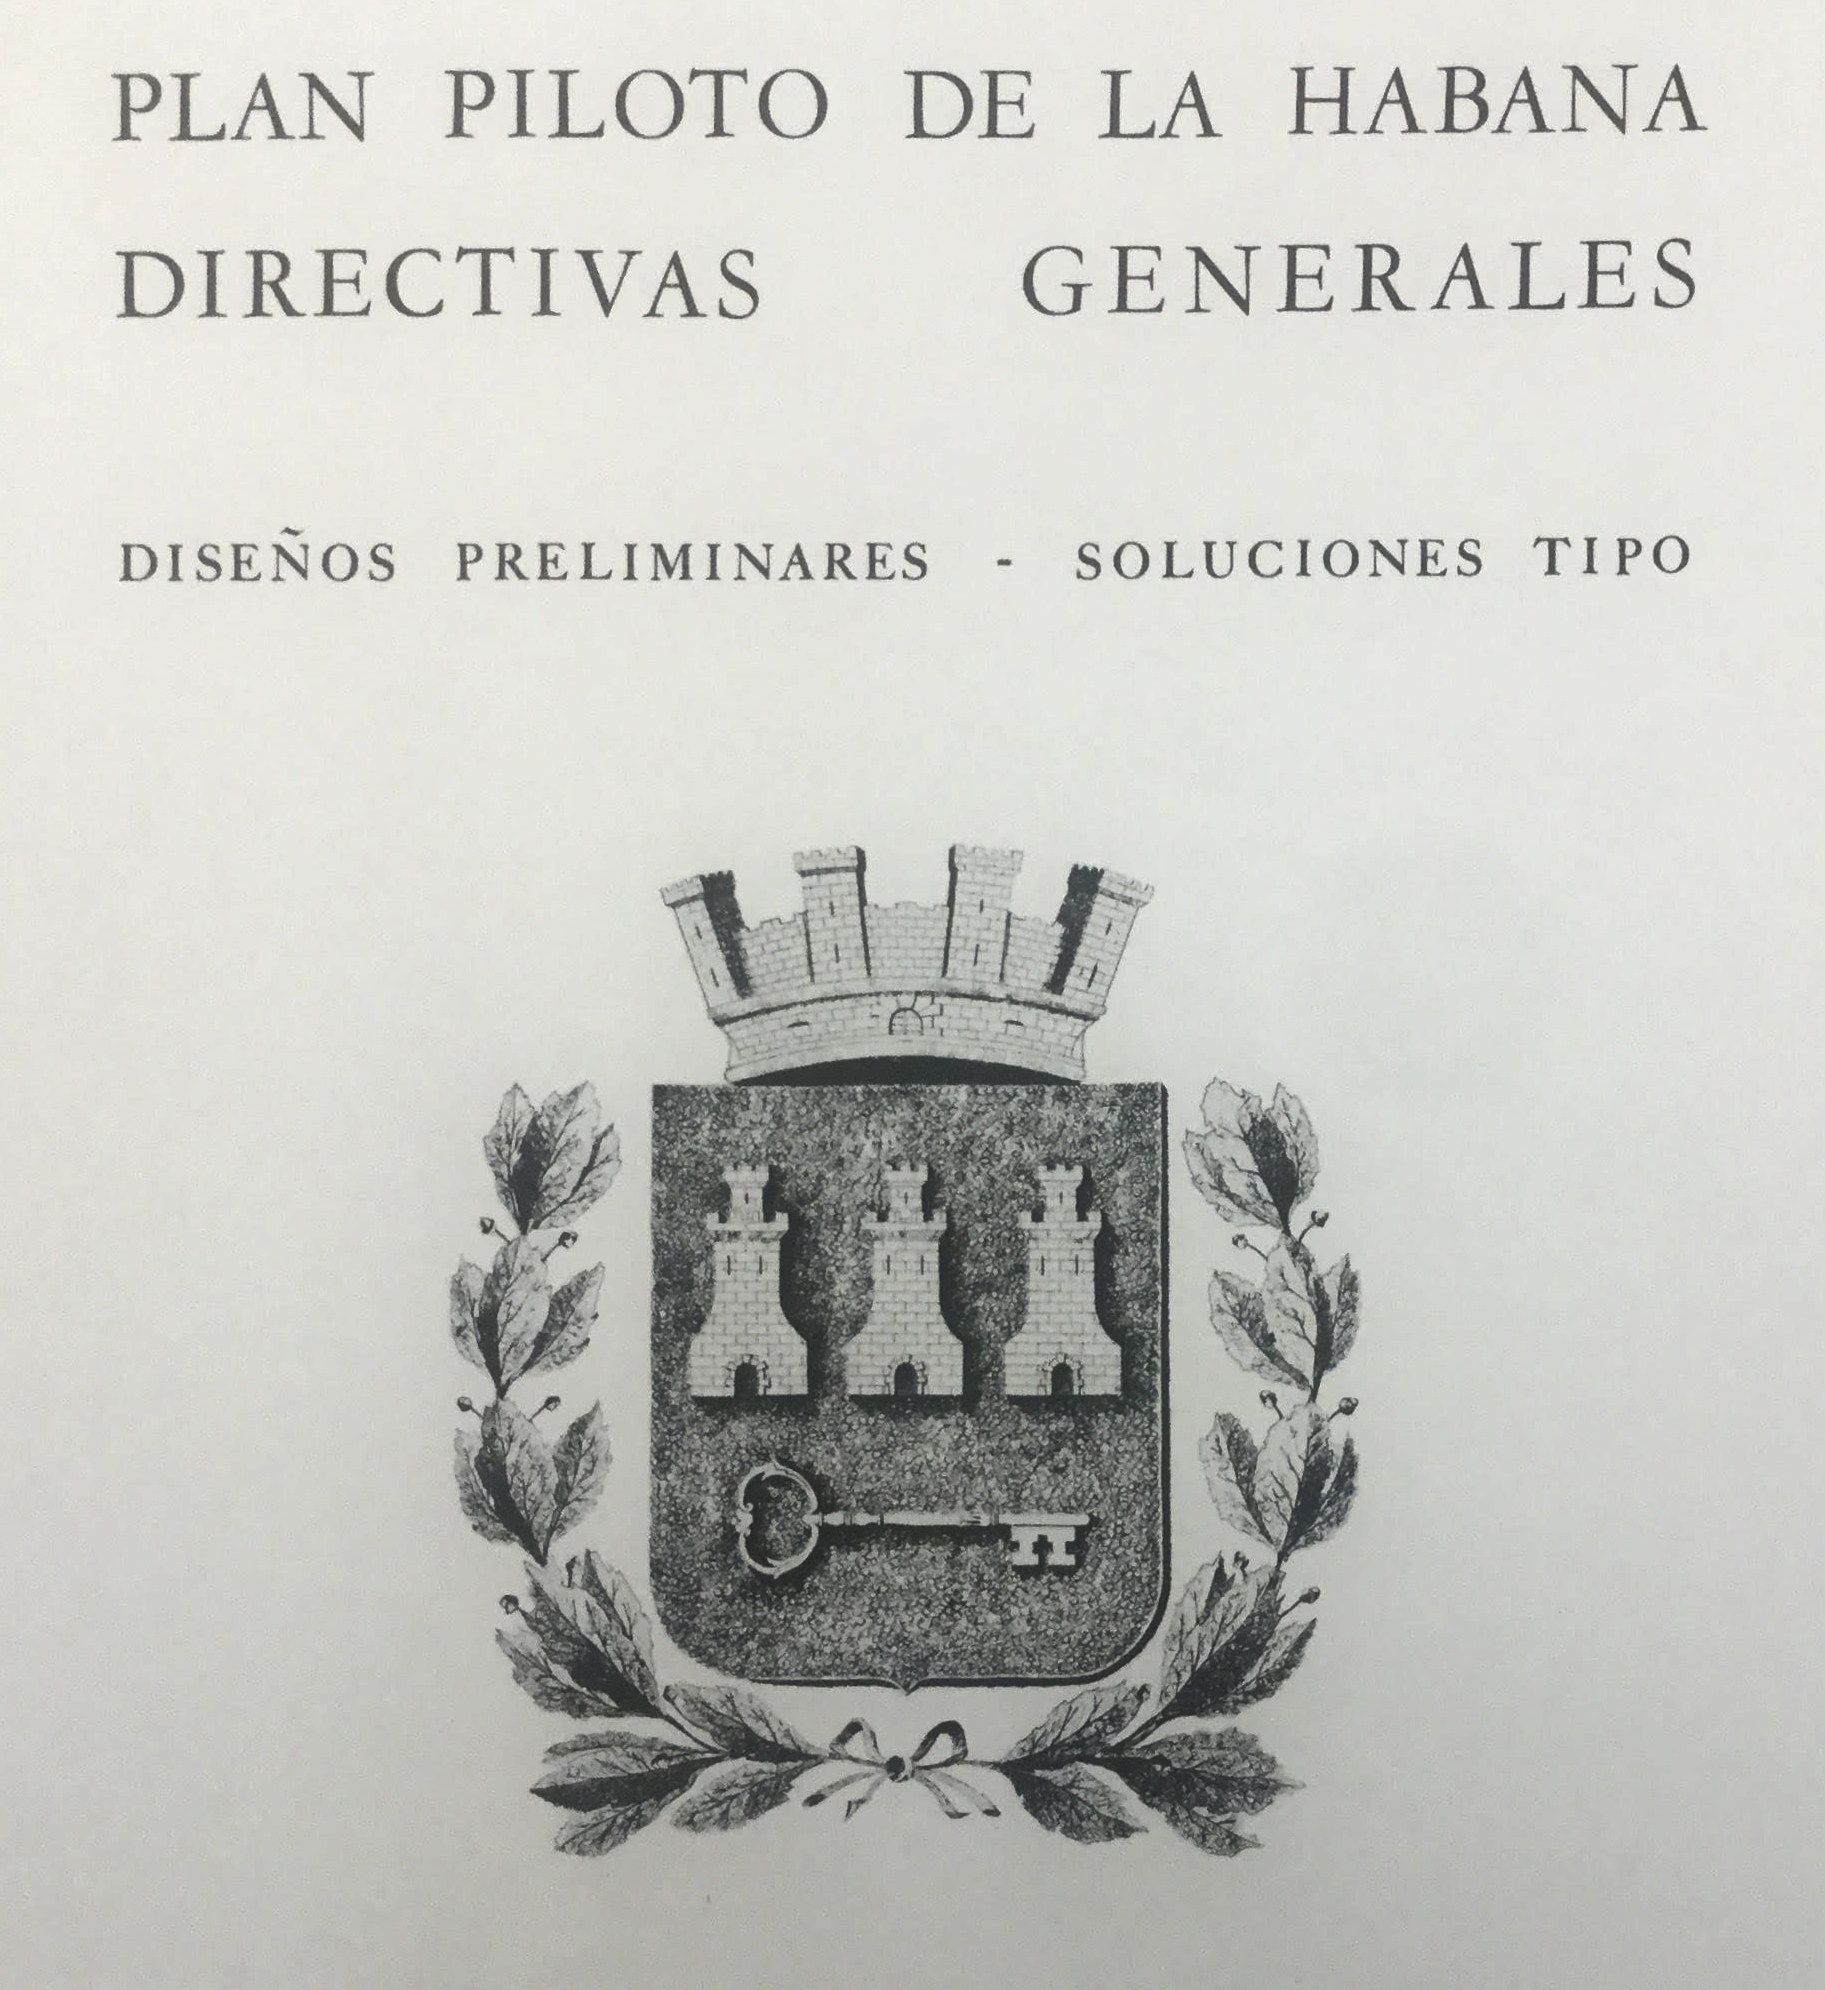 Havana Plan Piloto - Wikipedia